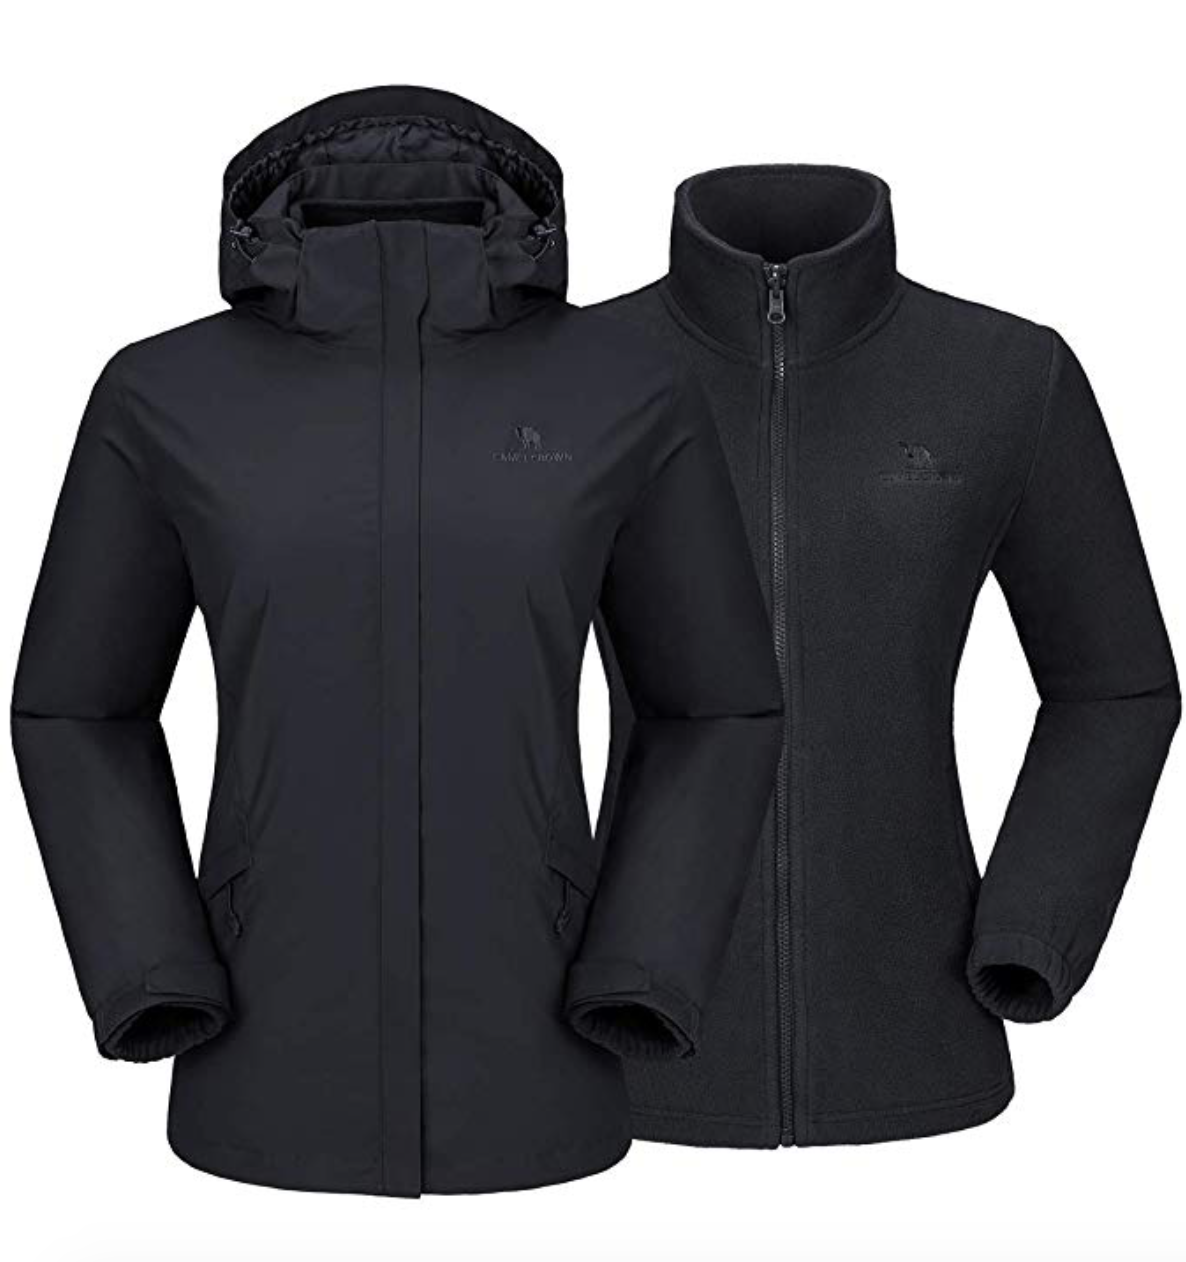 Camelsports Women's Winter Snowboard Jacket Under $150